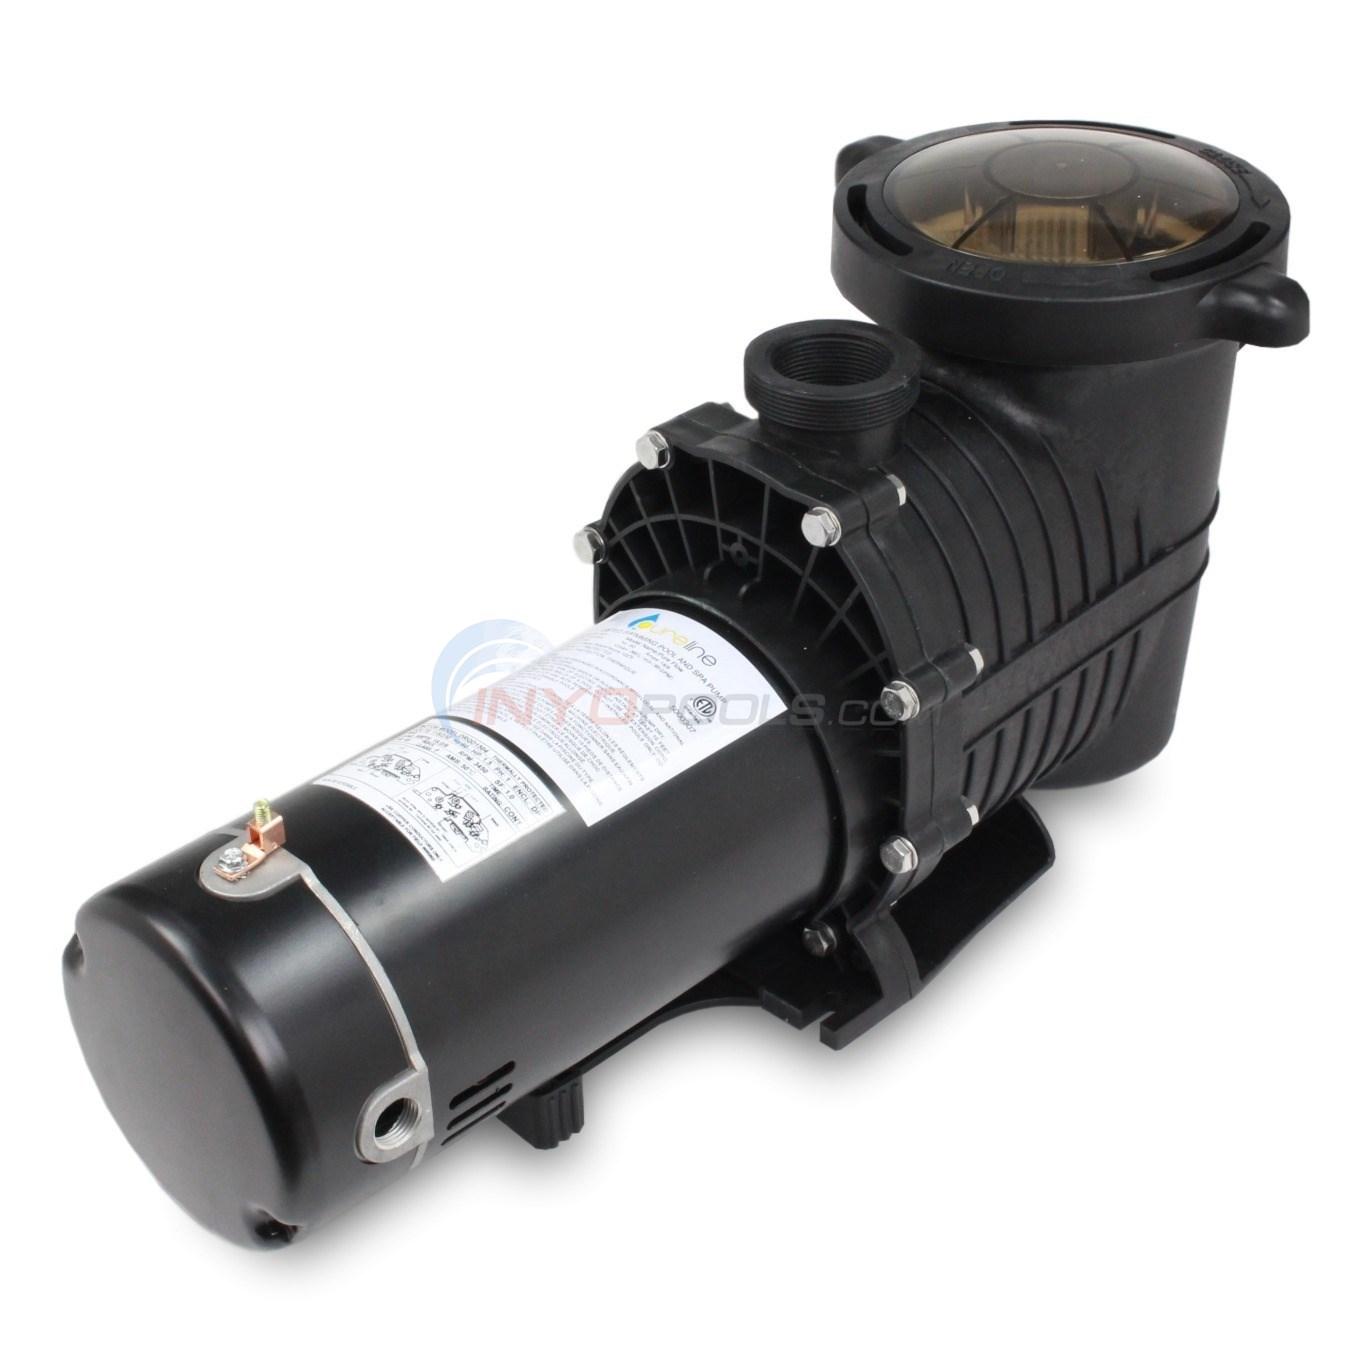 hydro pro ig pool pump wiring diagram example electrical wiring rh 162 212 157 63